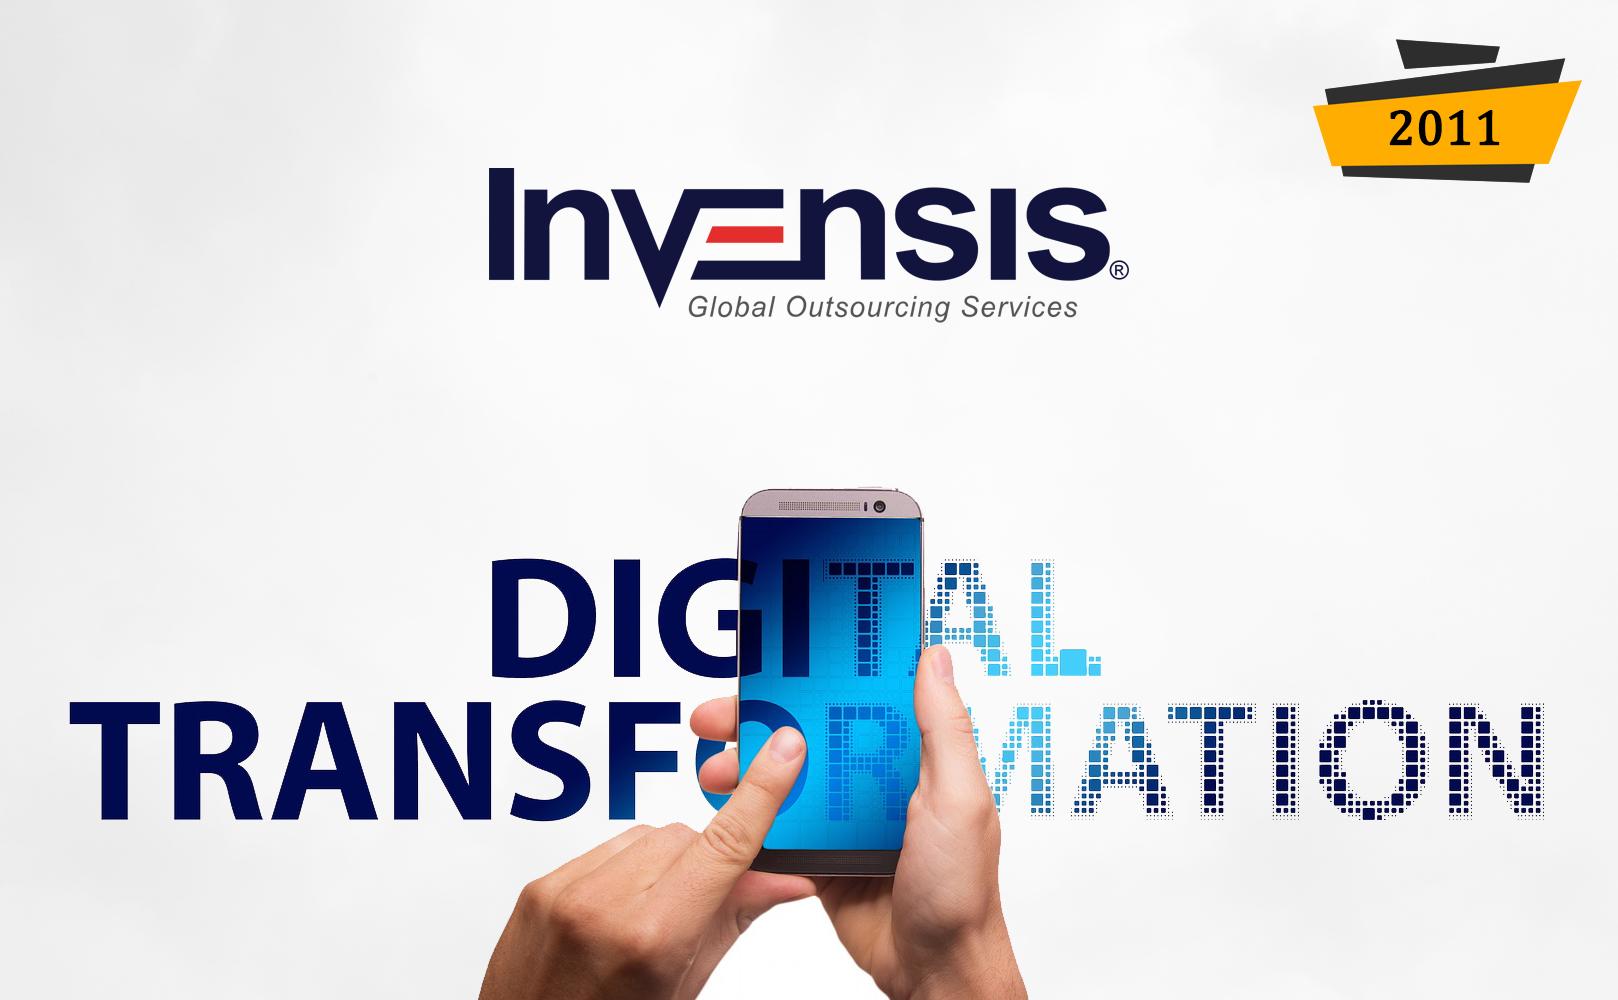 Digital Transformation of Invensis